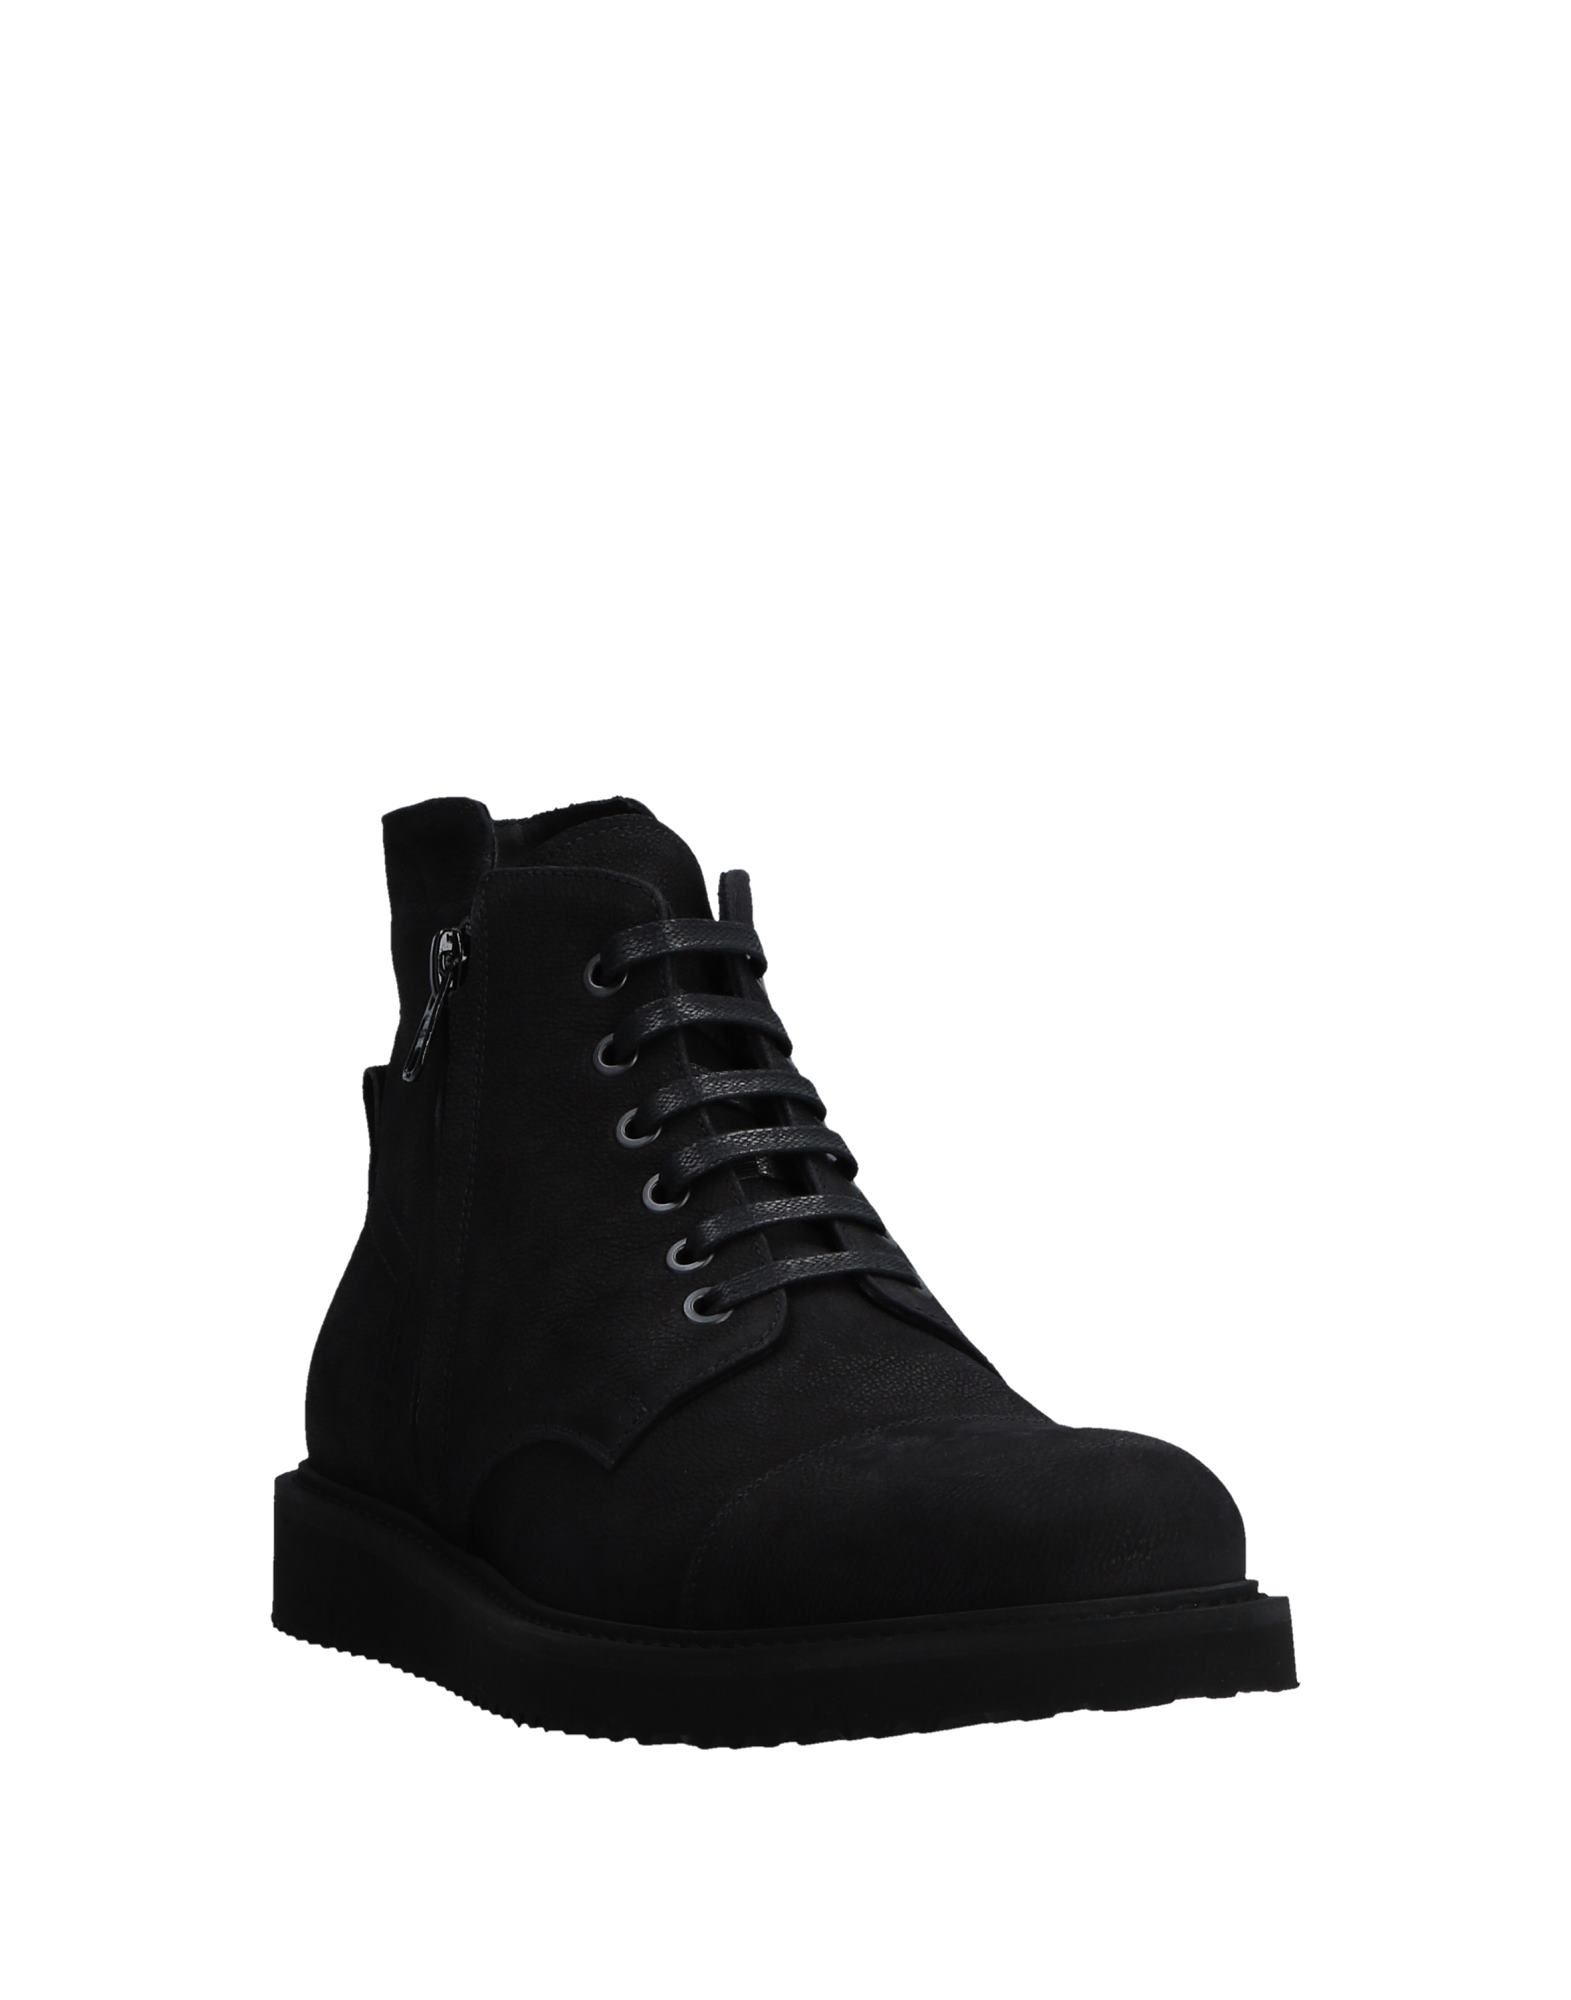 Bruno Bordese Boots - Men Men Men Bruno Bordese Boots online on  Australia - 11522868RX 58da1e